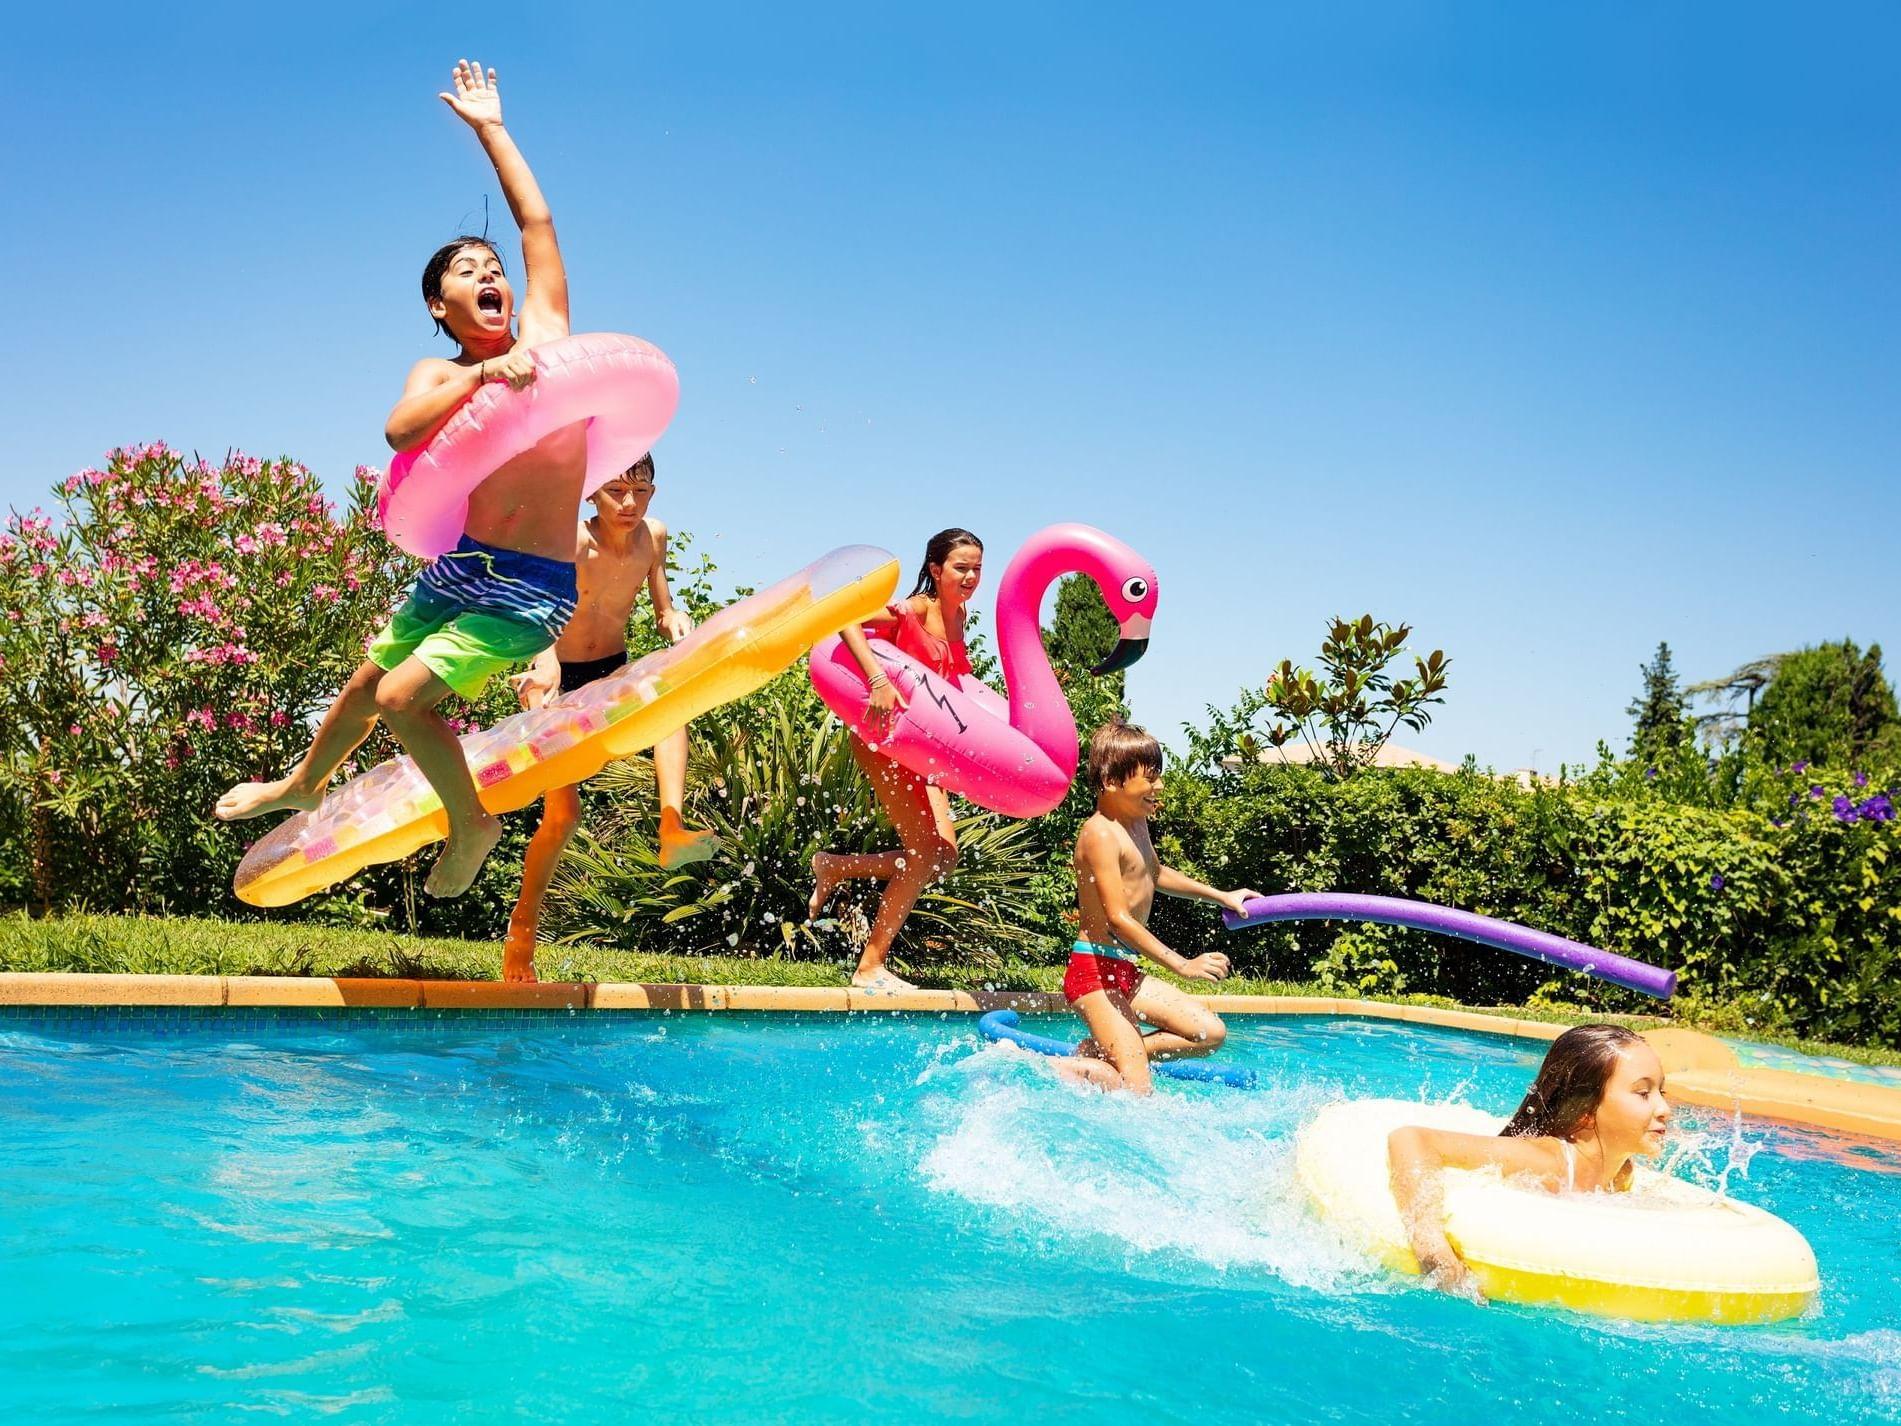 Kids playing in kids pool at Daydream Island Resort